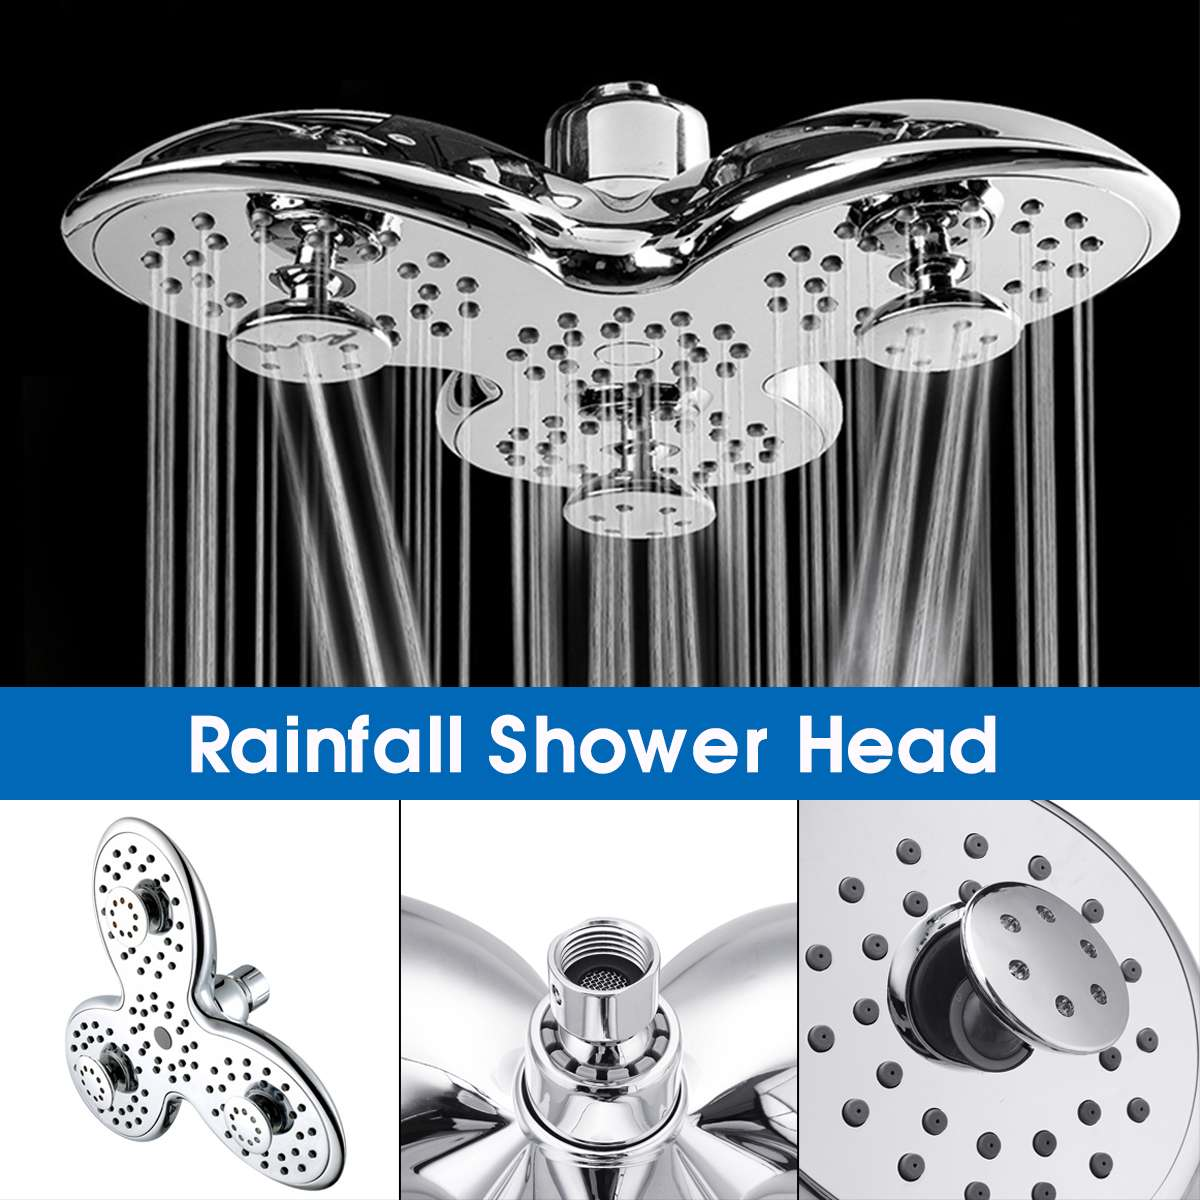 10 Inch ABS Bathroom Shower Head Petal Shape 3 Functions Bathroom Top Shower Head Rainfall Jetting Shower SPA Shower Head